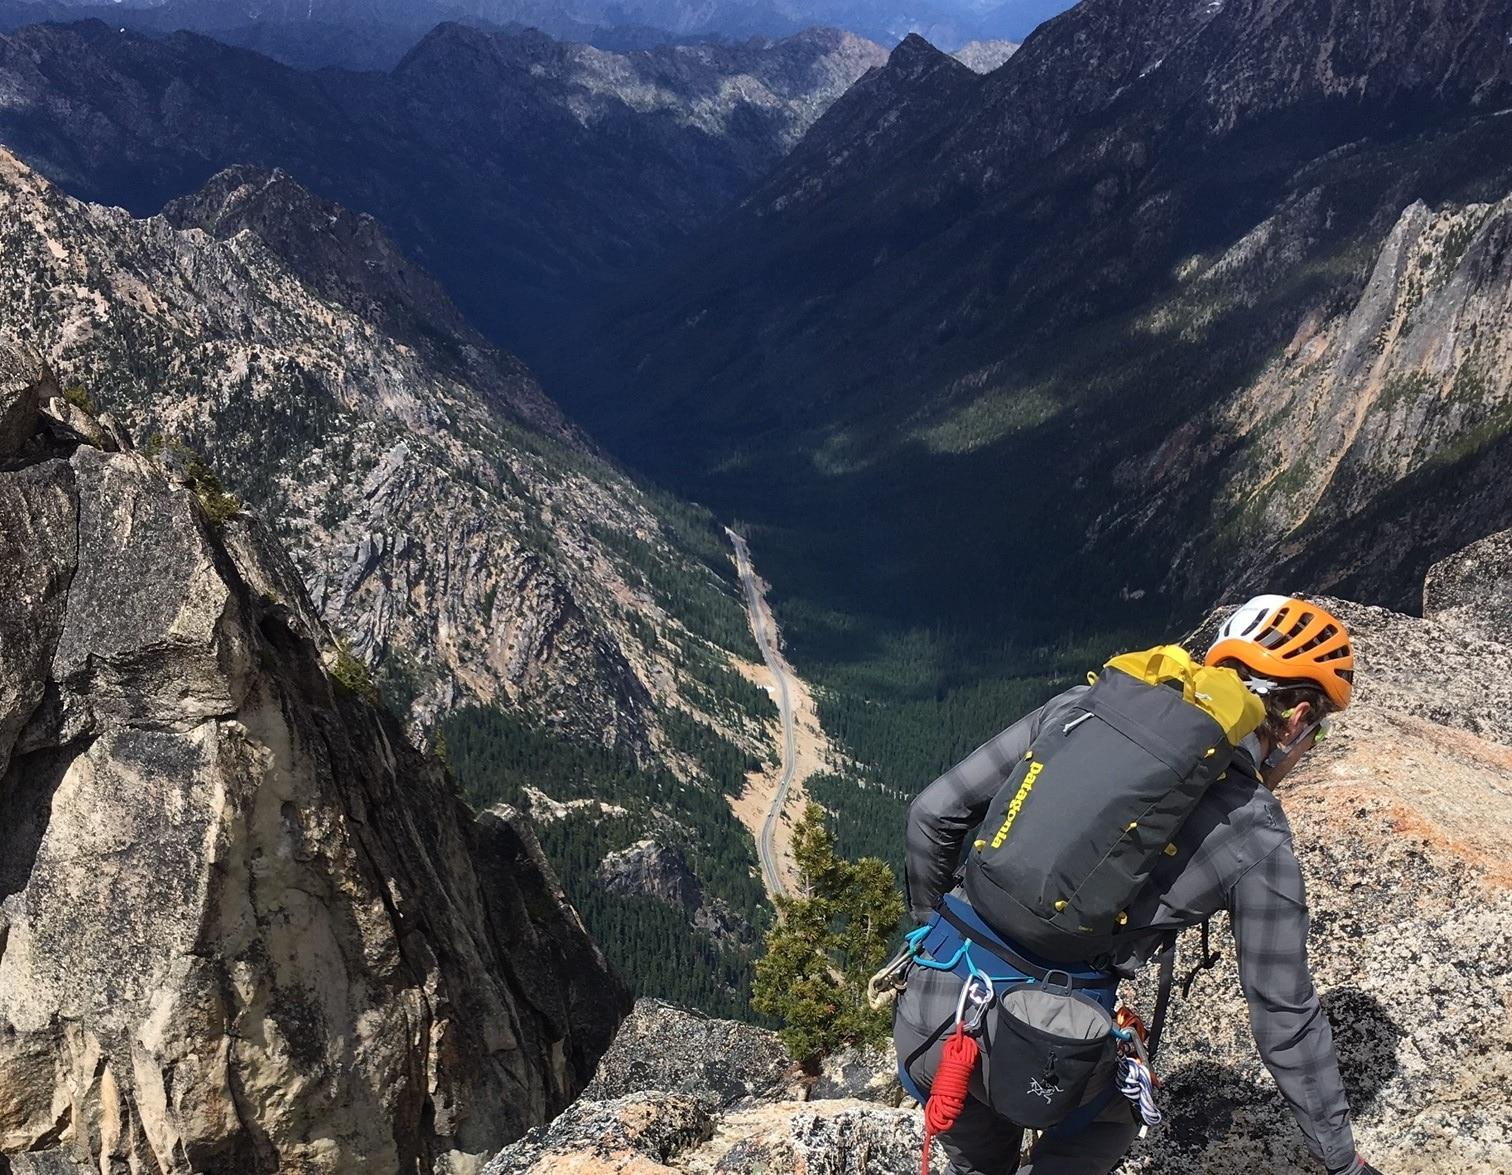 Medications & Prescriptions For Mountain Climbing